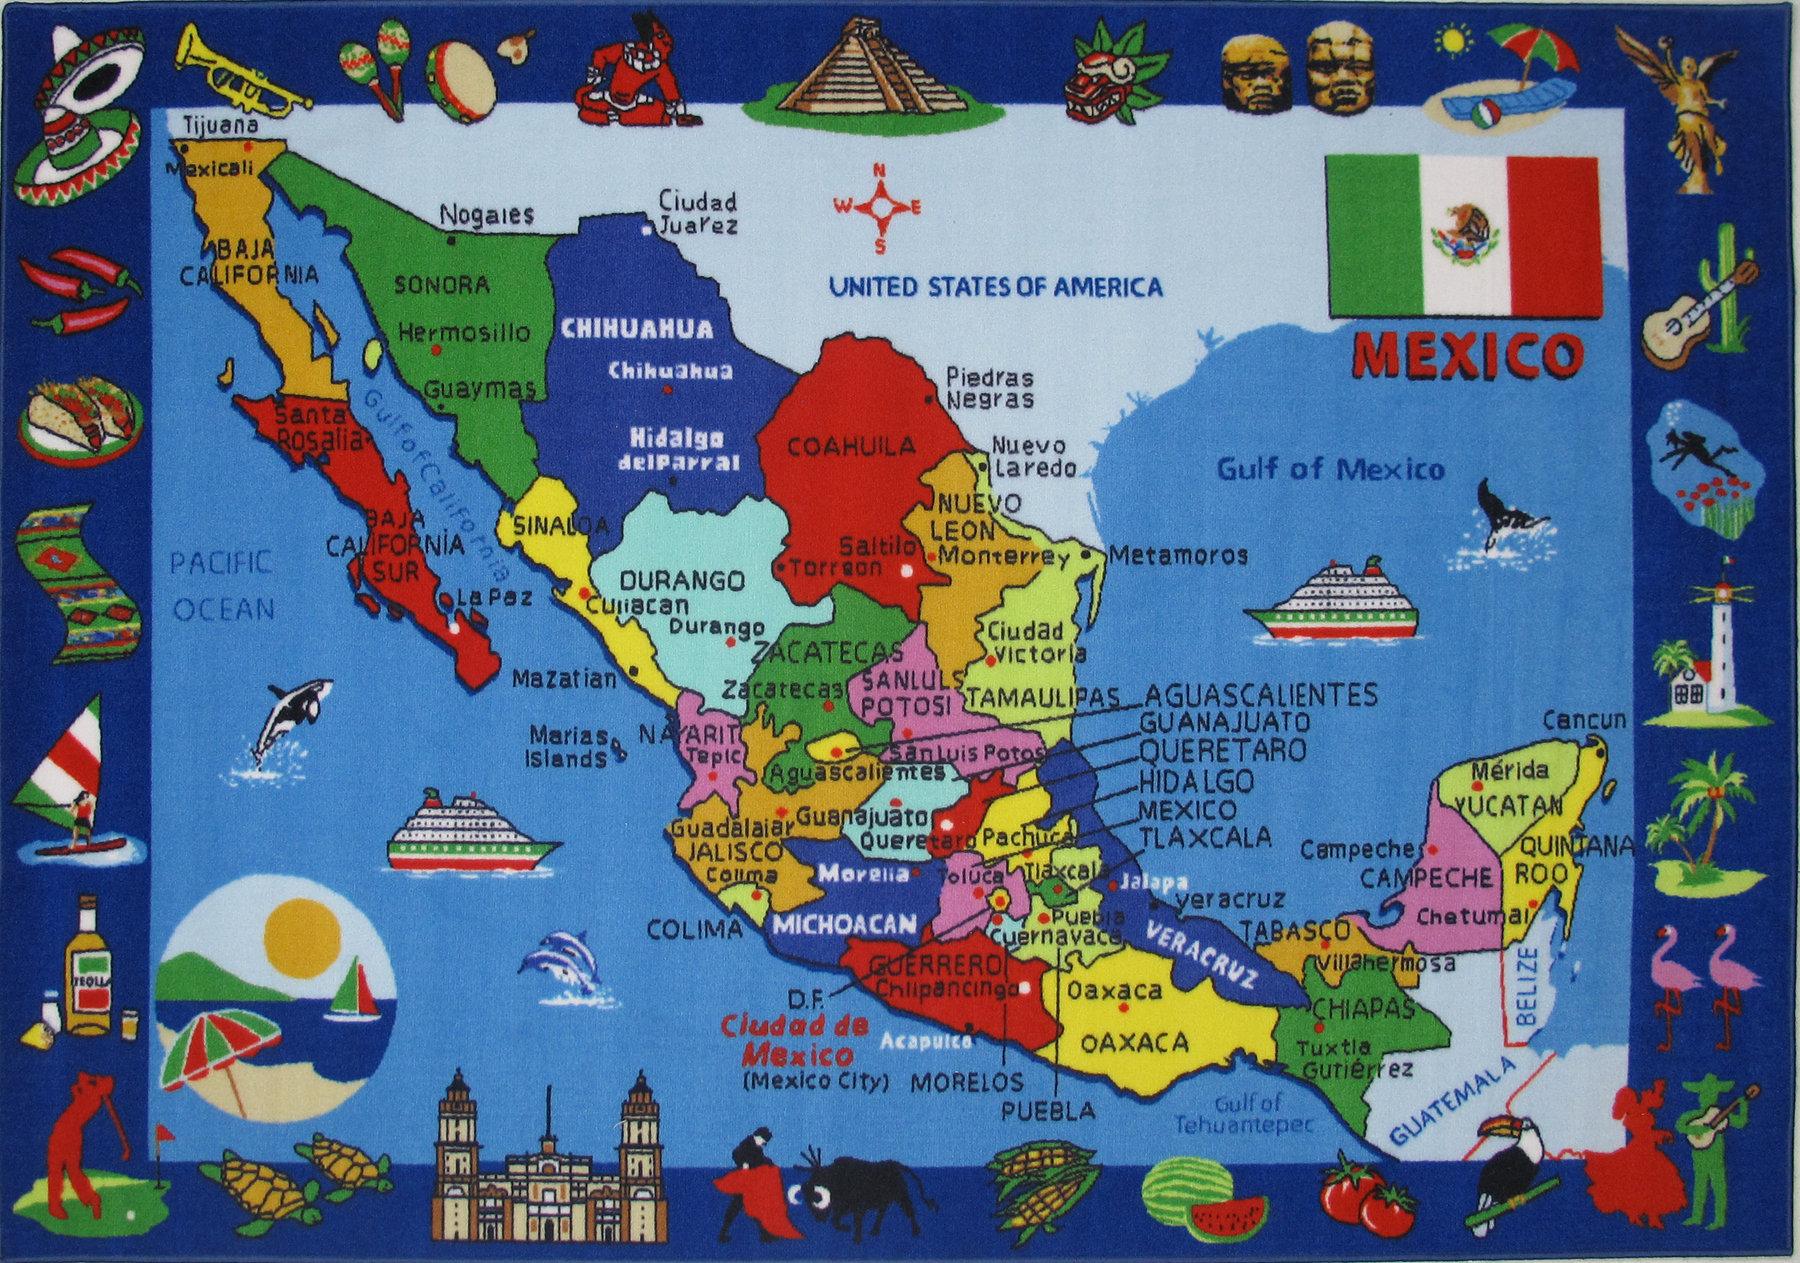 Corina Map of Mexico Kids Rug on chiapas mexico, nayarit mexico, map of new york, map of the united states, san carlos mexico, puebla mexico, oaxaca mexico, huatulco mexico, map of germany, map of europe, map of virginia, map of ohio, map of florida, map of south america, map of canada, taxco mexico, map of us, mazatlan mexico, cities in mexico, map of africa, map of the world, map of usa, map of georgia, map of california, manzanillo mexico, guadalajara mexico, detailed map mexico, map of italy, jalisco mexico, michoacan mexico, map of china, aguascalientes mexico, queretaro mexico, sinaloa mexico, leon mexico, punta mita mexico, map of texas, tulum mexico, map of north carolina,